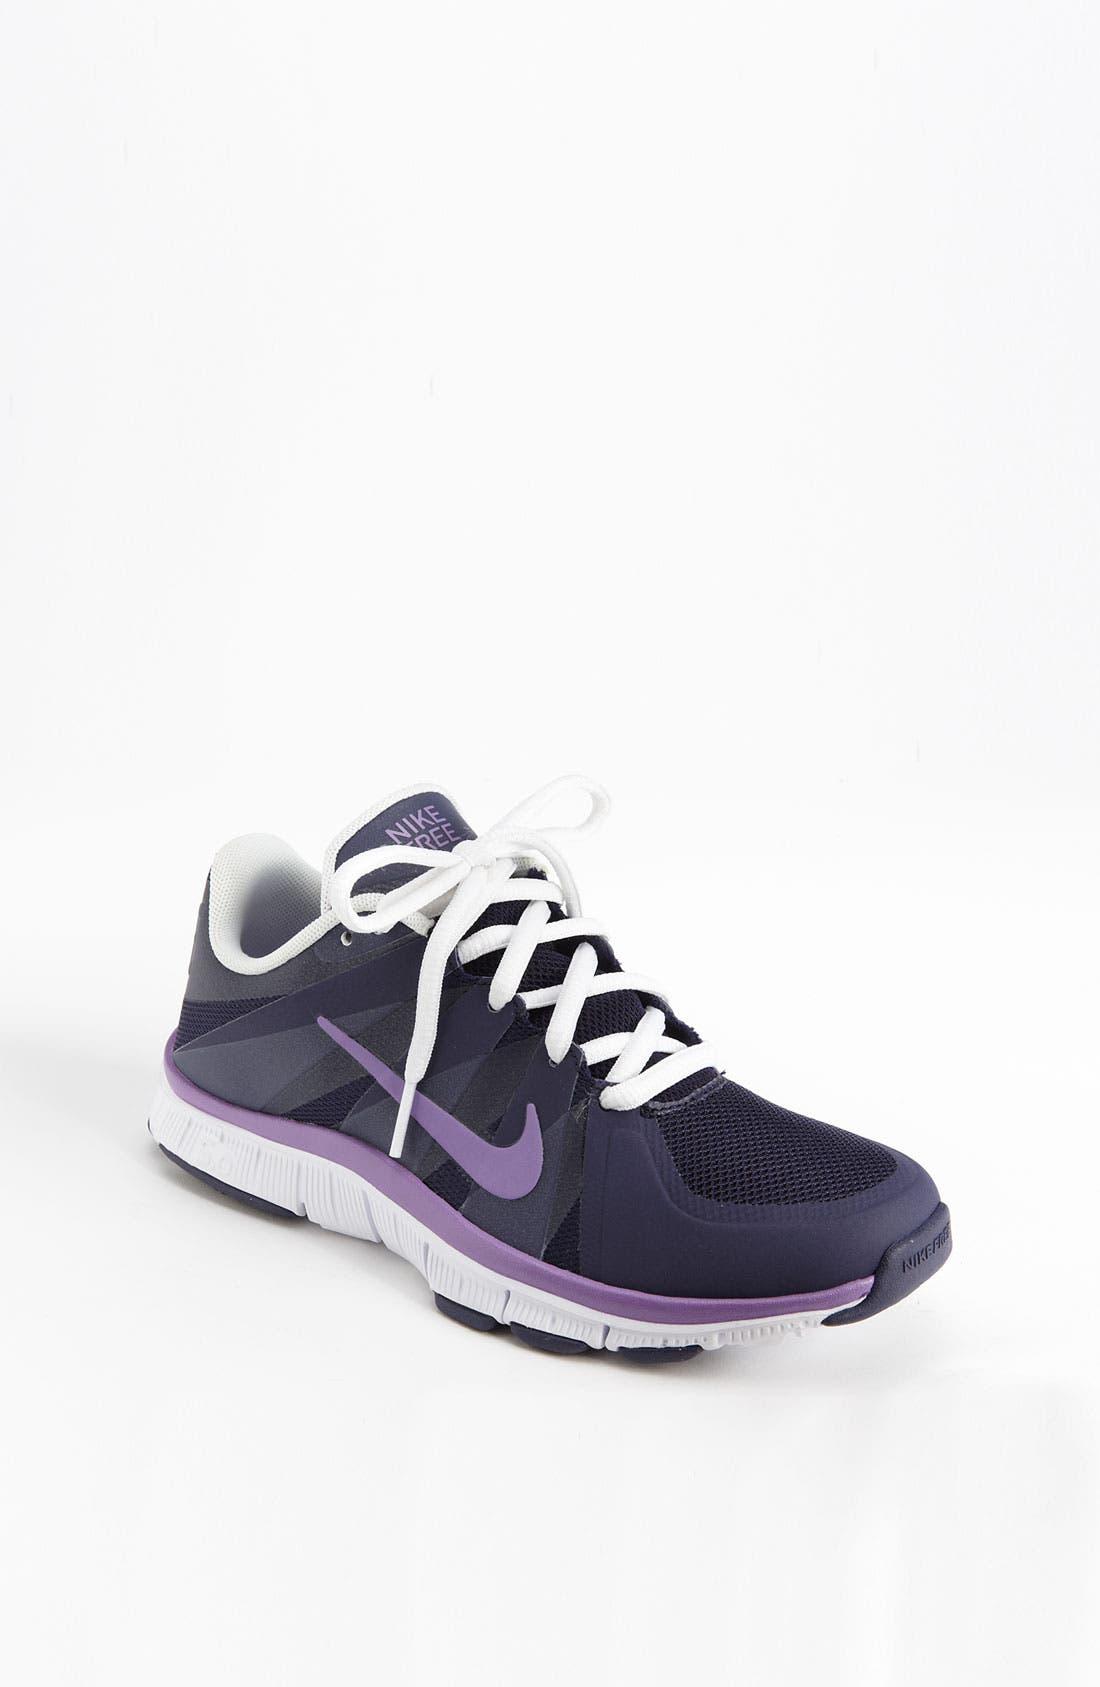 Main Image - Nike 'Free Trainer 5.0' Sneaker (Big Kid)